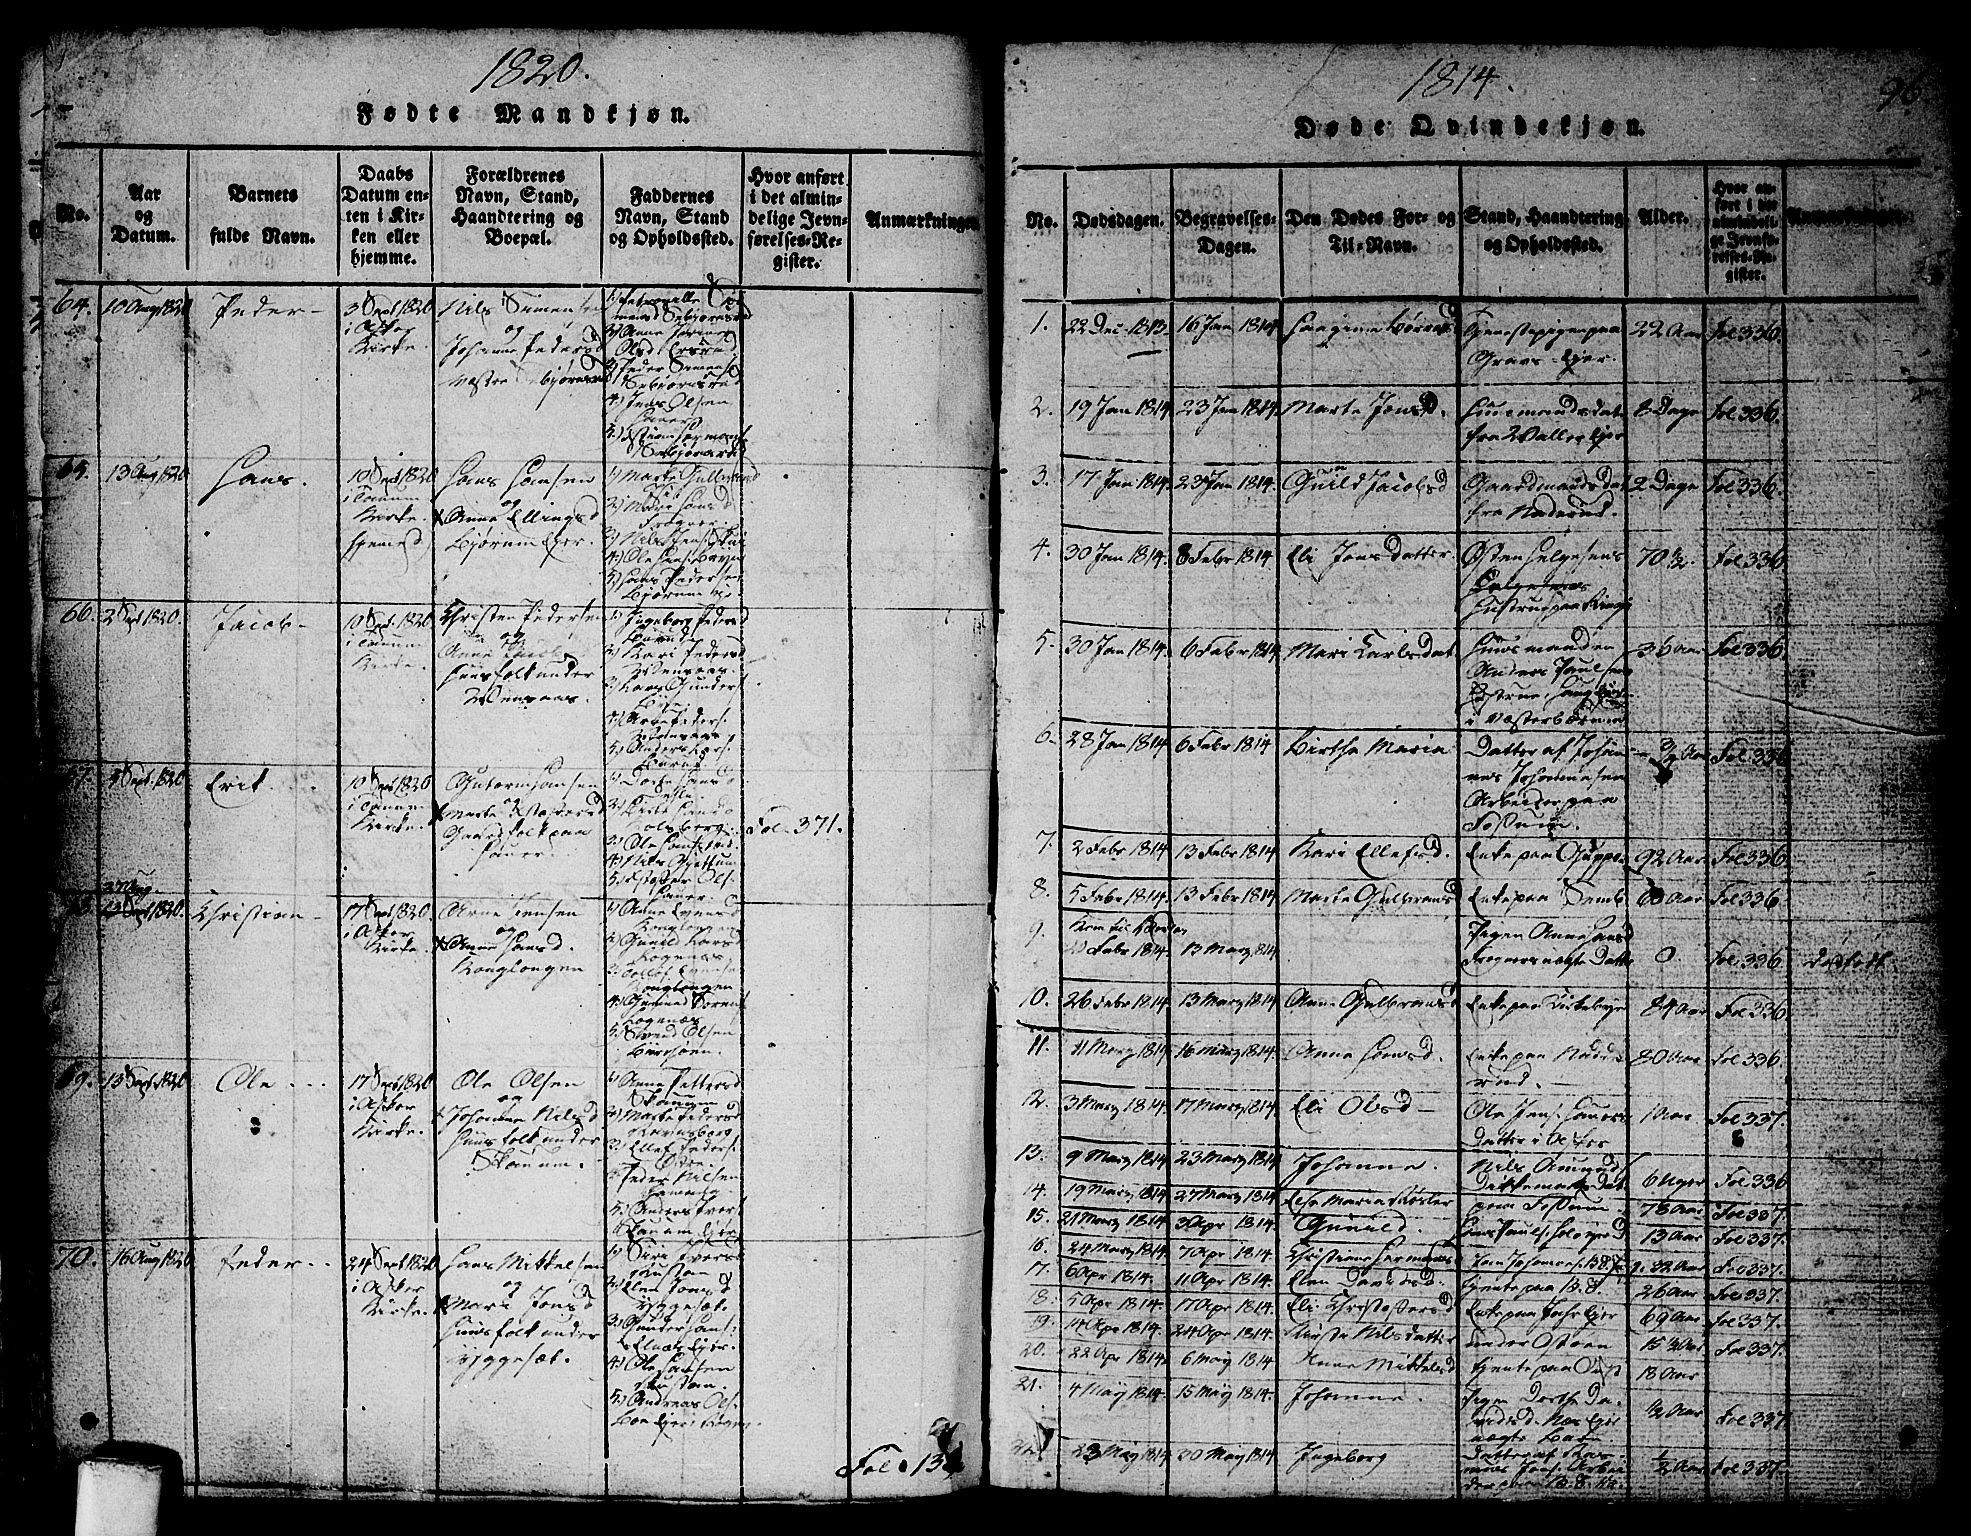 SAO, Asker prestekontor Kirkebøker, G/Ga/L0001: Klokkerbok nr. I 1, 1814-1830, s. 96